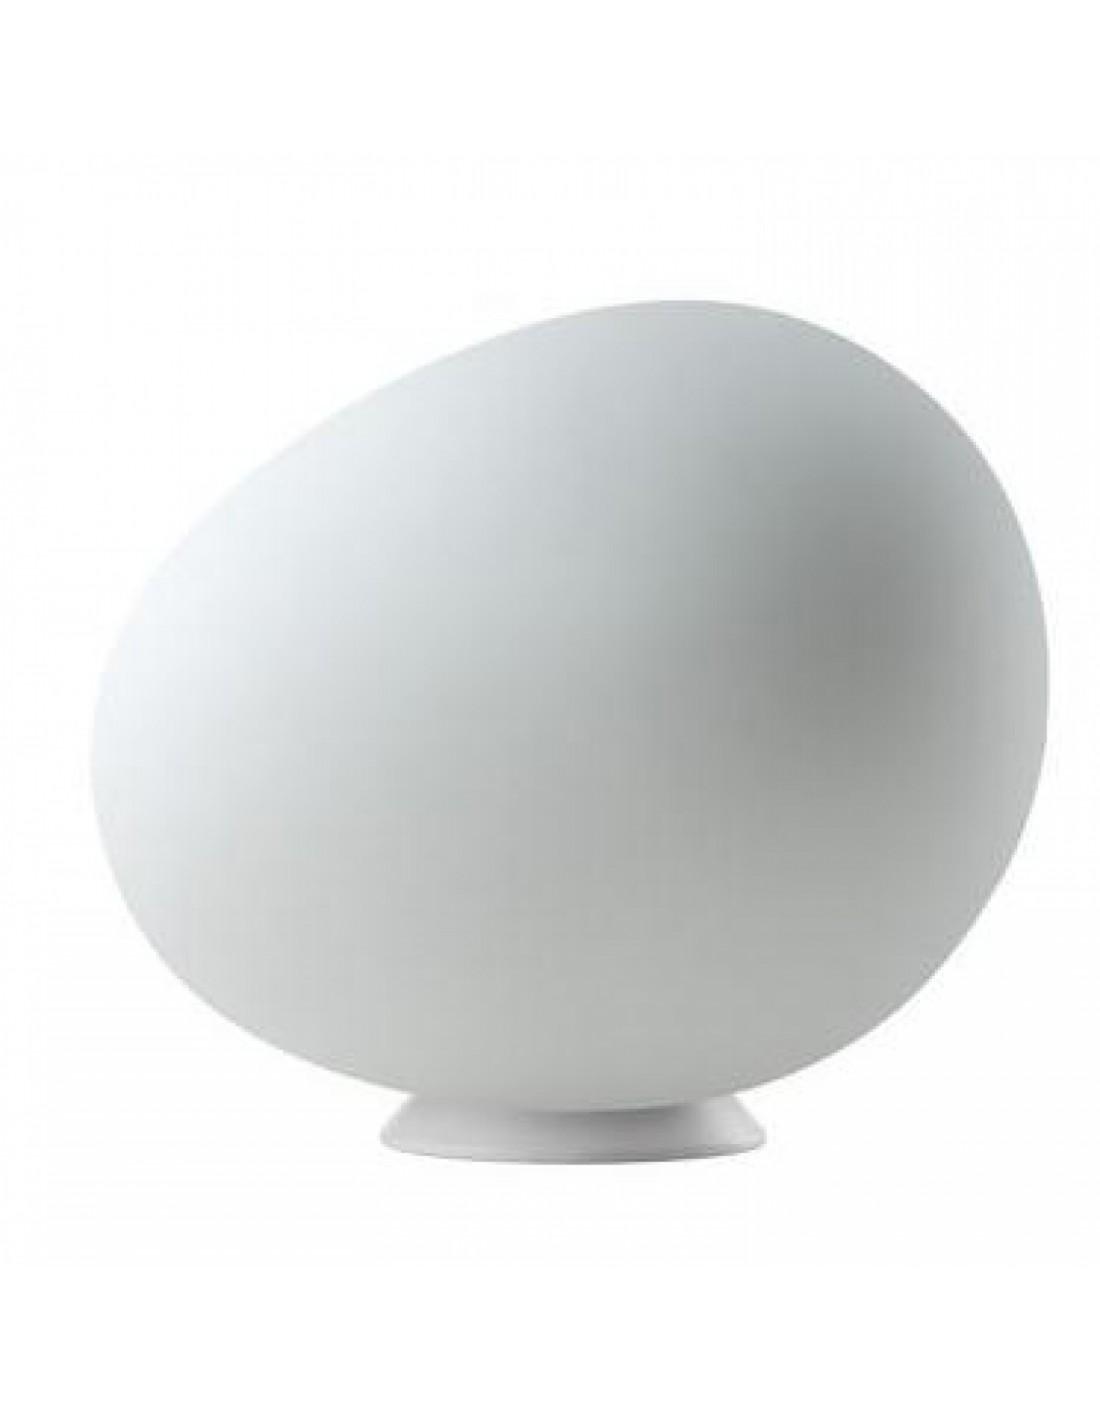 LAMPE DE TABLE POLY GREGG GRANDE foscarini blanc